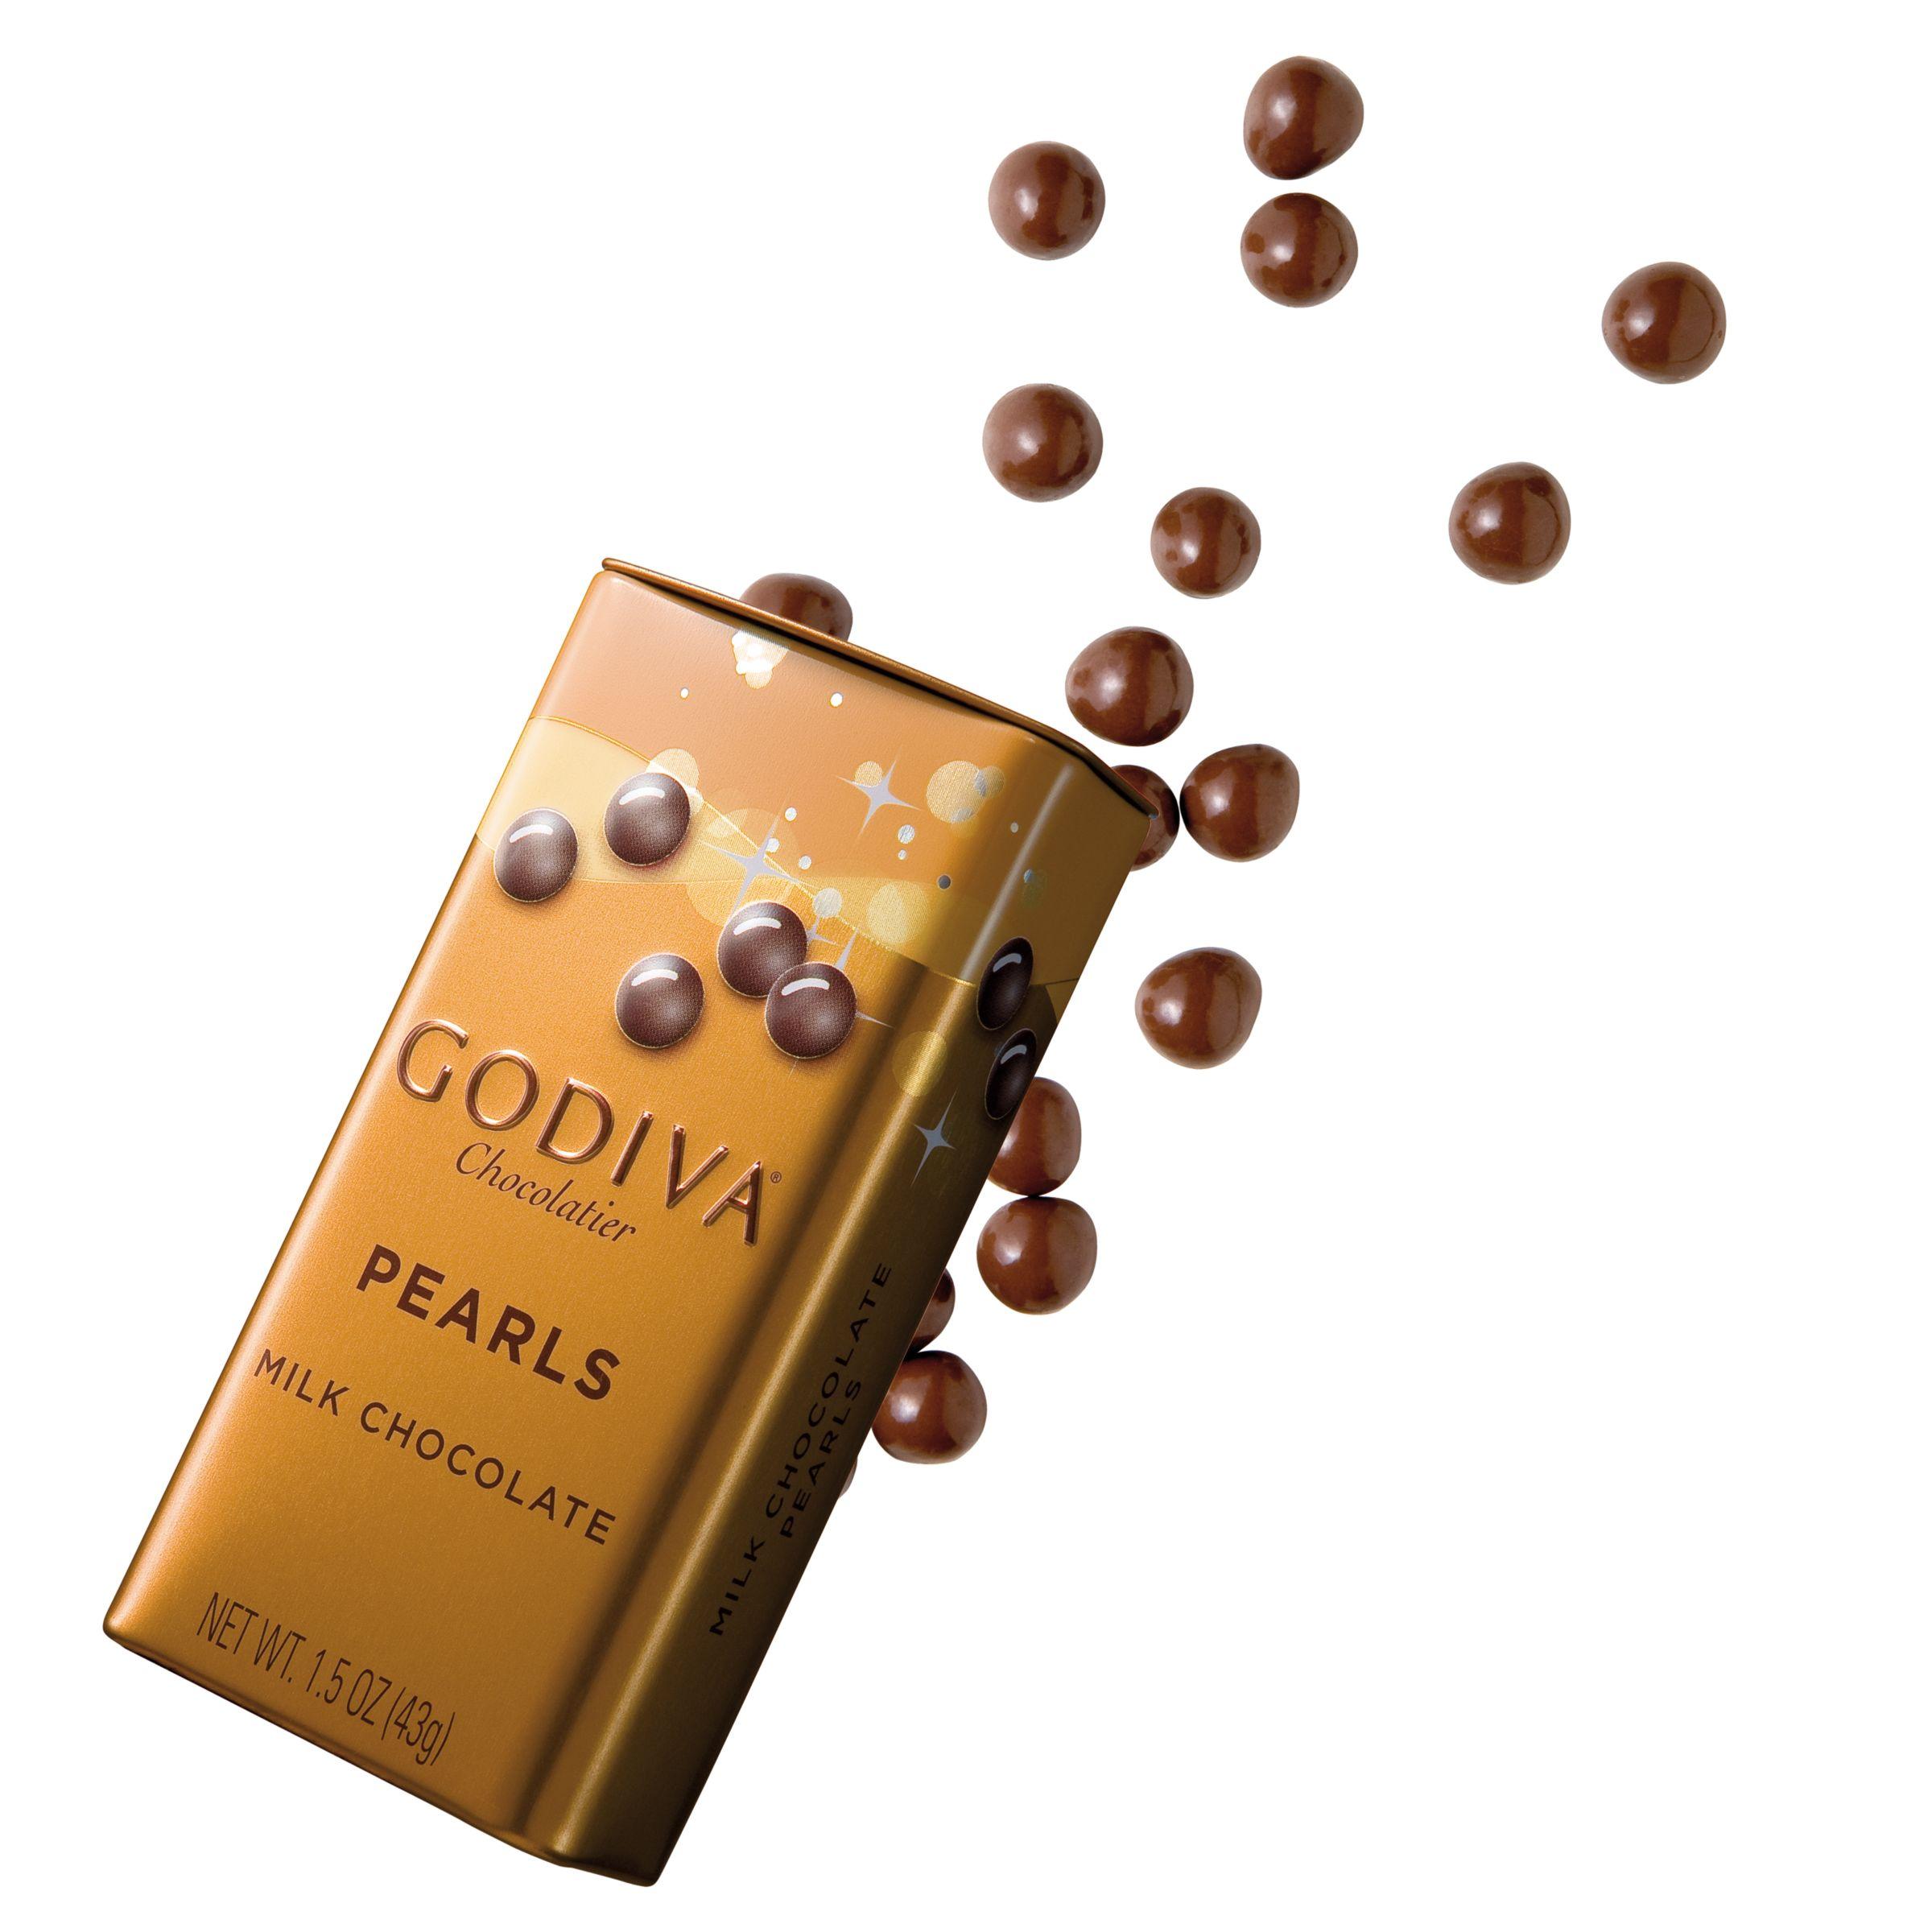 Godiva Godiva Milk Chocolate Pearls In a Tin, 40g